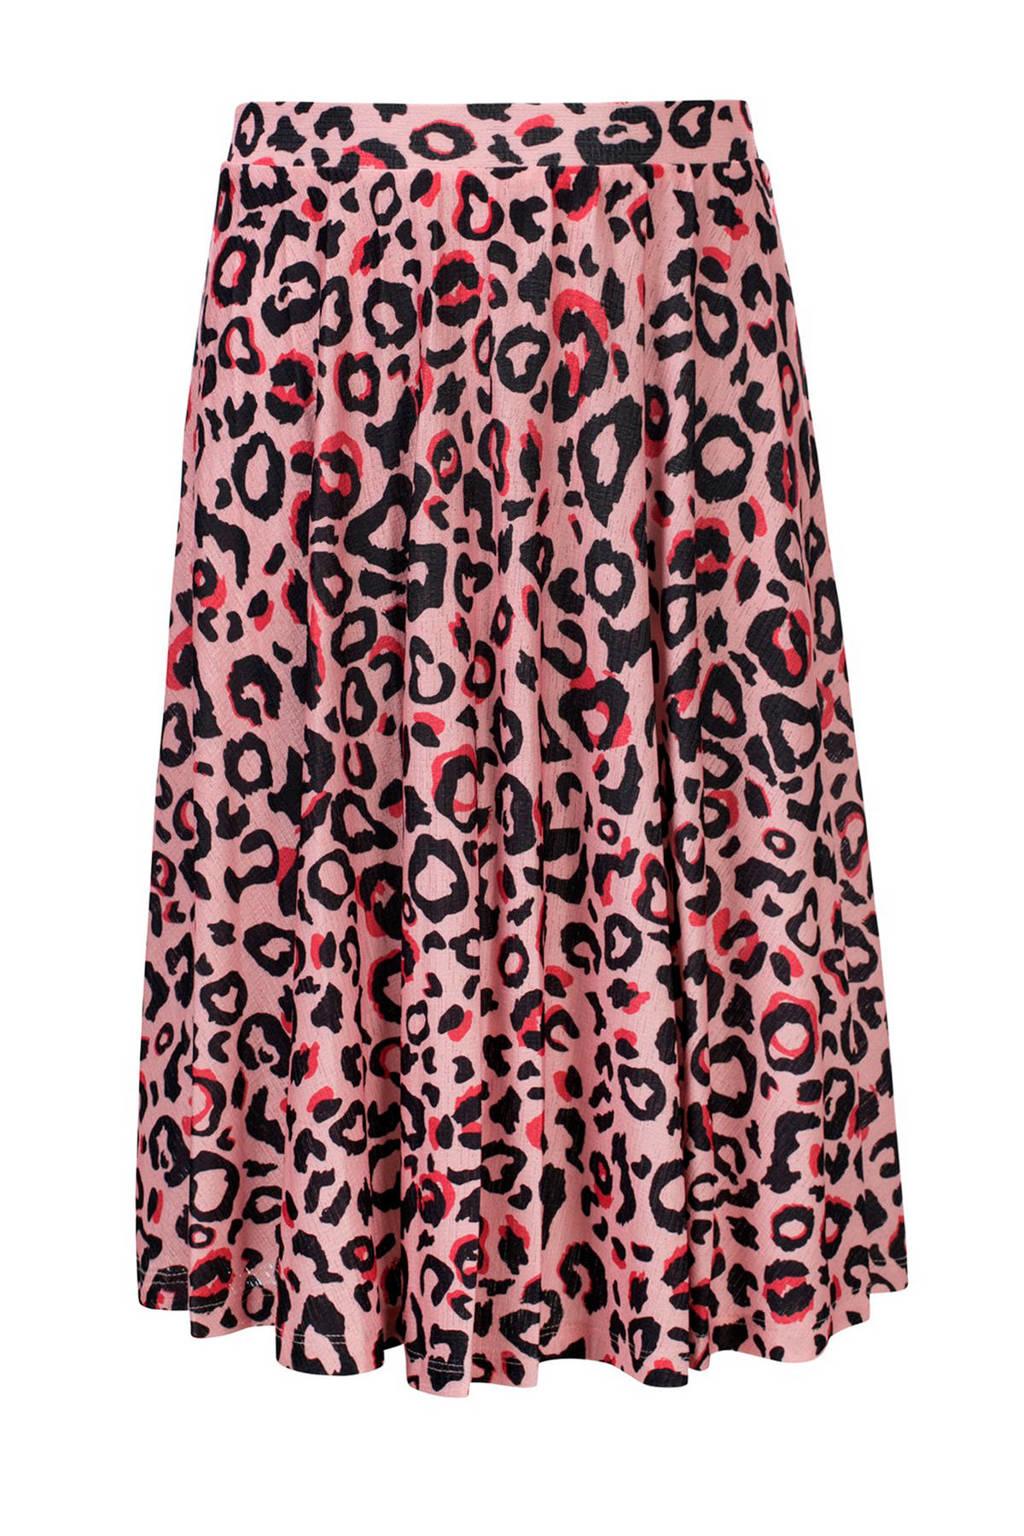 LOOXS rok met panterprint lichtroze/roze/zwart, Lichtroze/roze/zwart